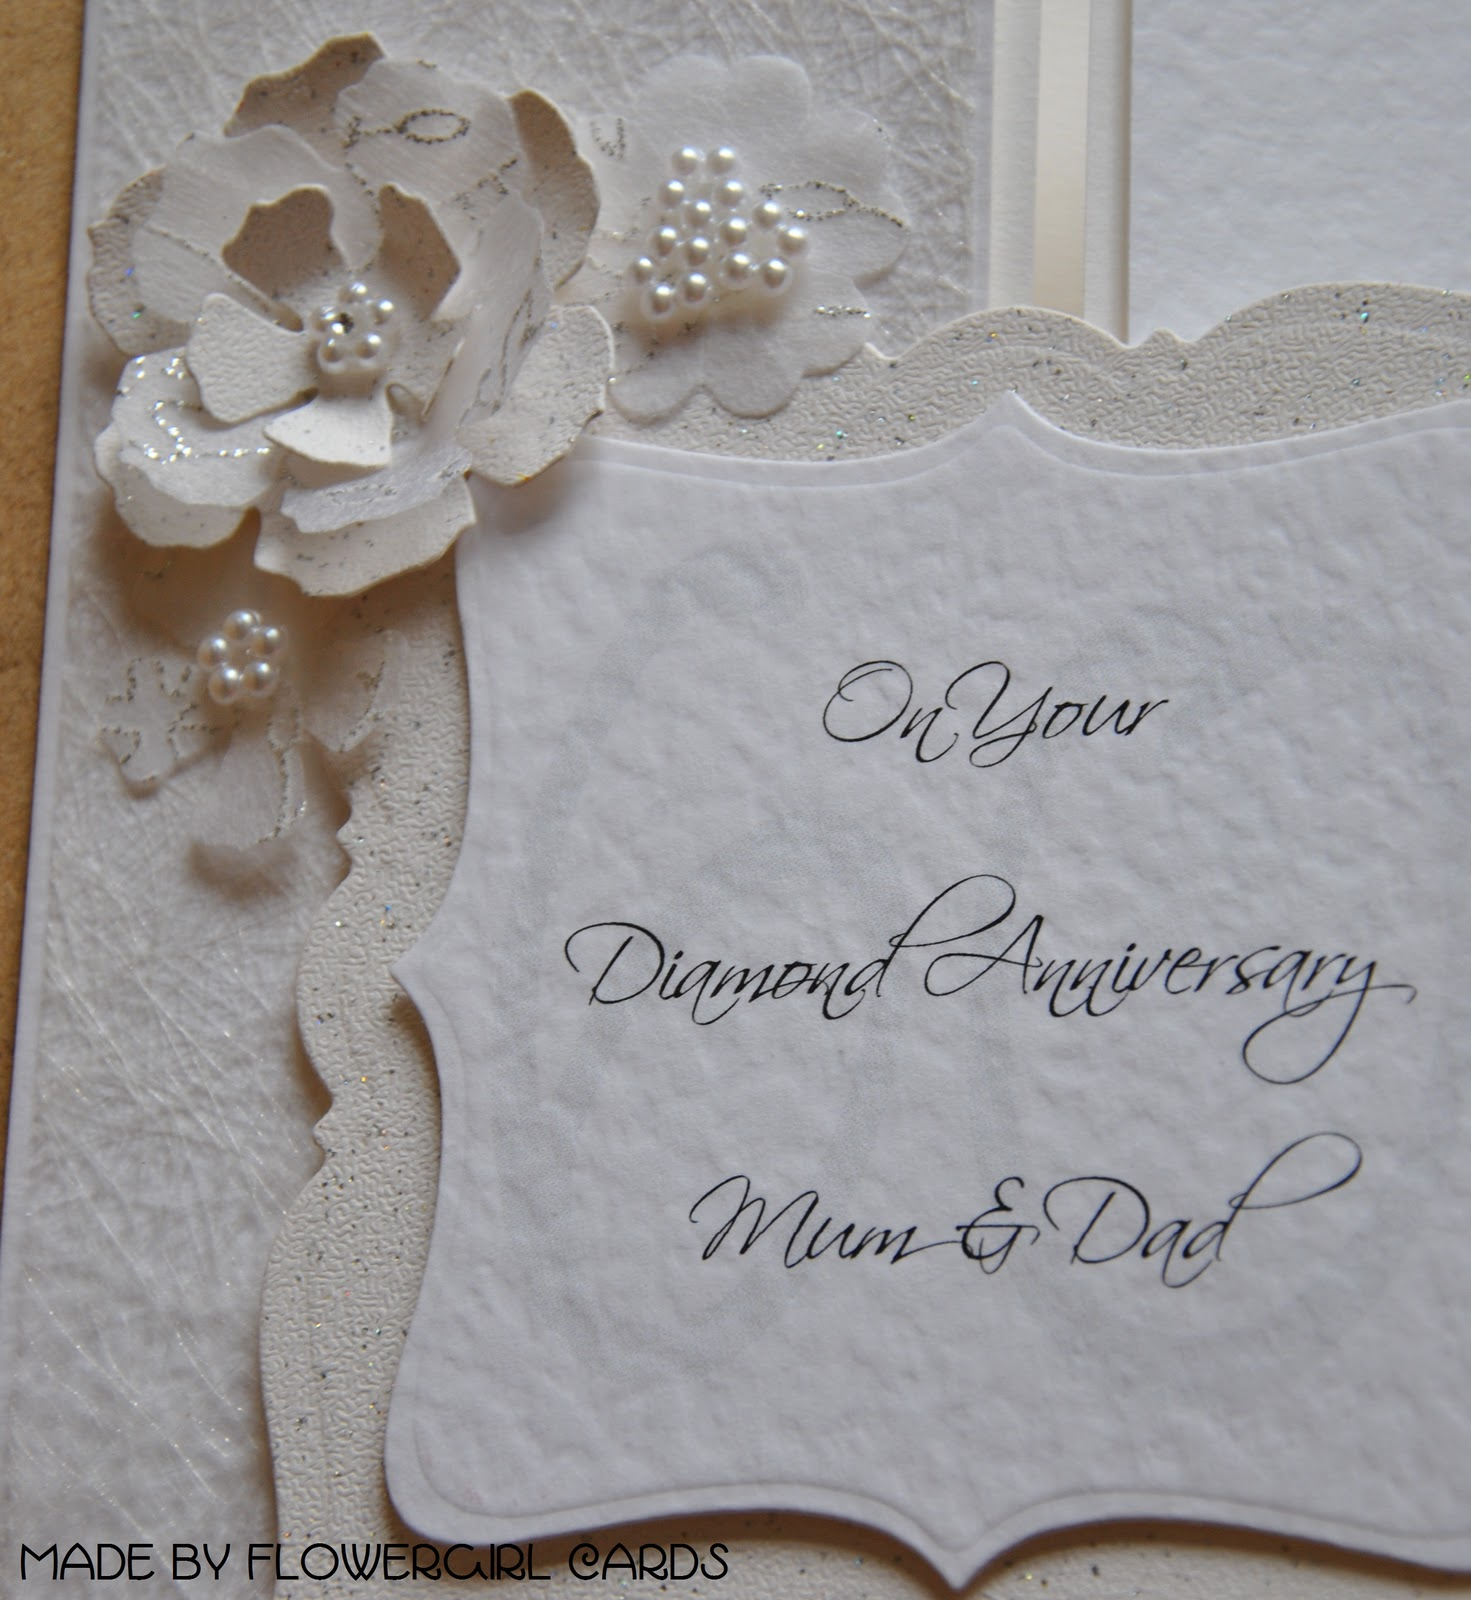 60th Wedding Anniversary Card Making Ideas Part - 27: Diamond Anniversary Card